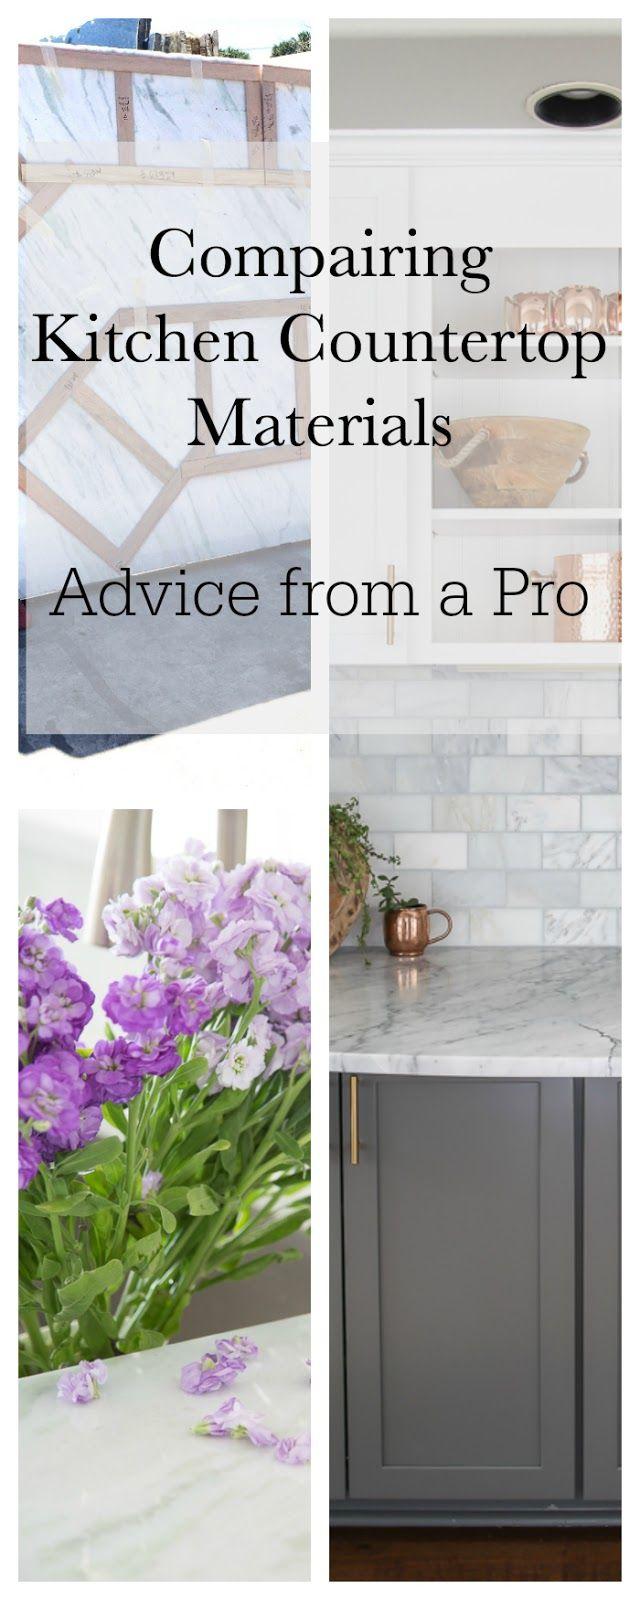 17 best ideas about Kitchen Countertop Materials – Kitchen Countertop Material Comparison